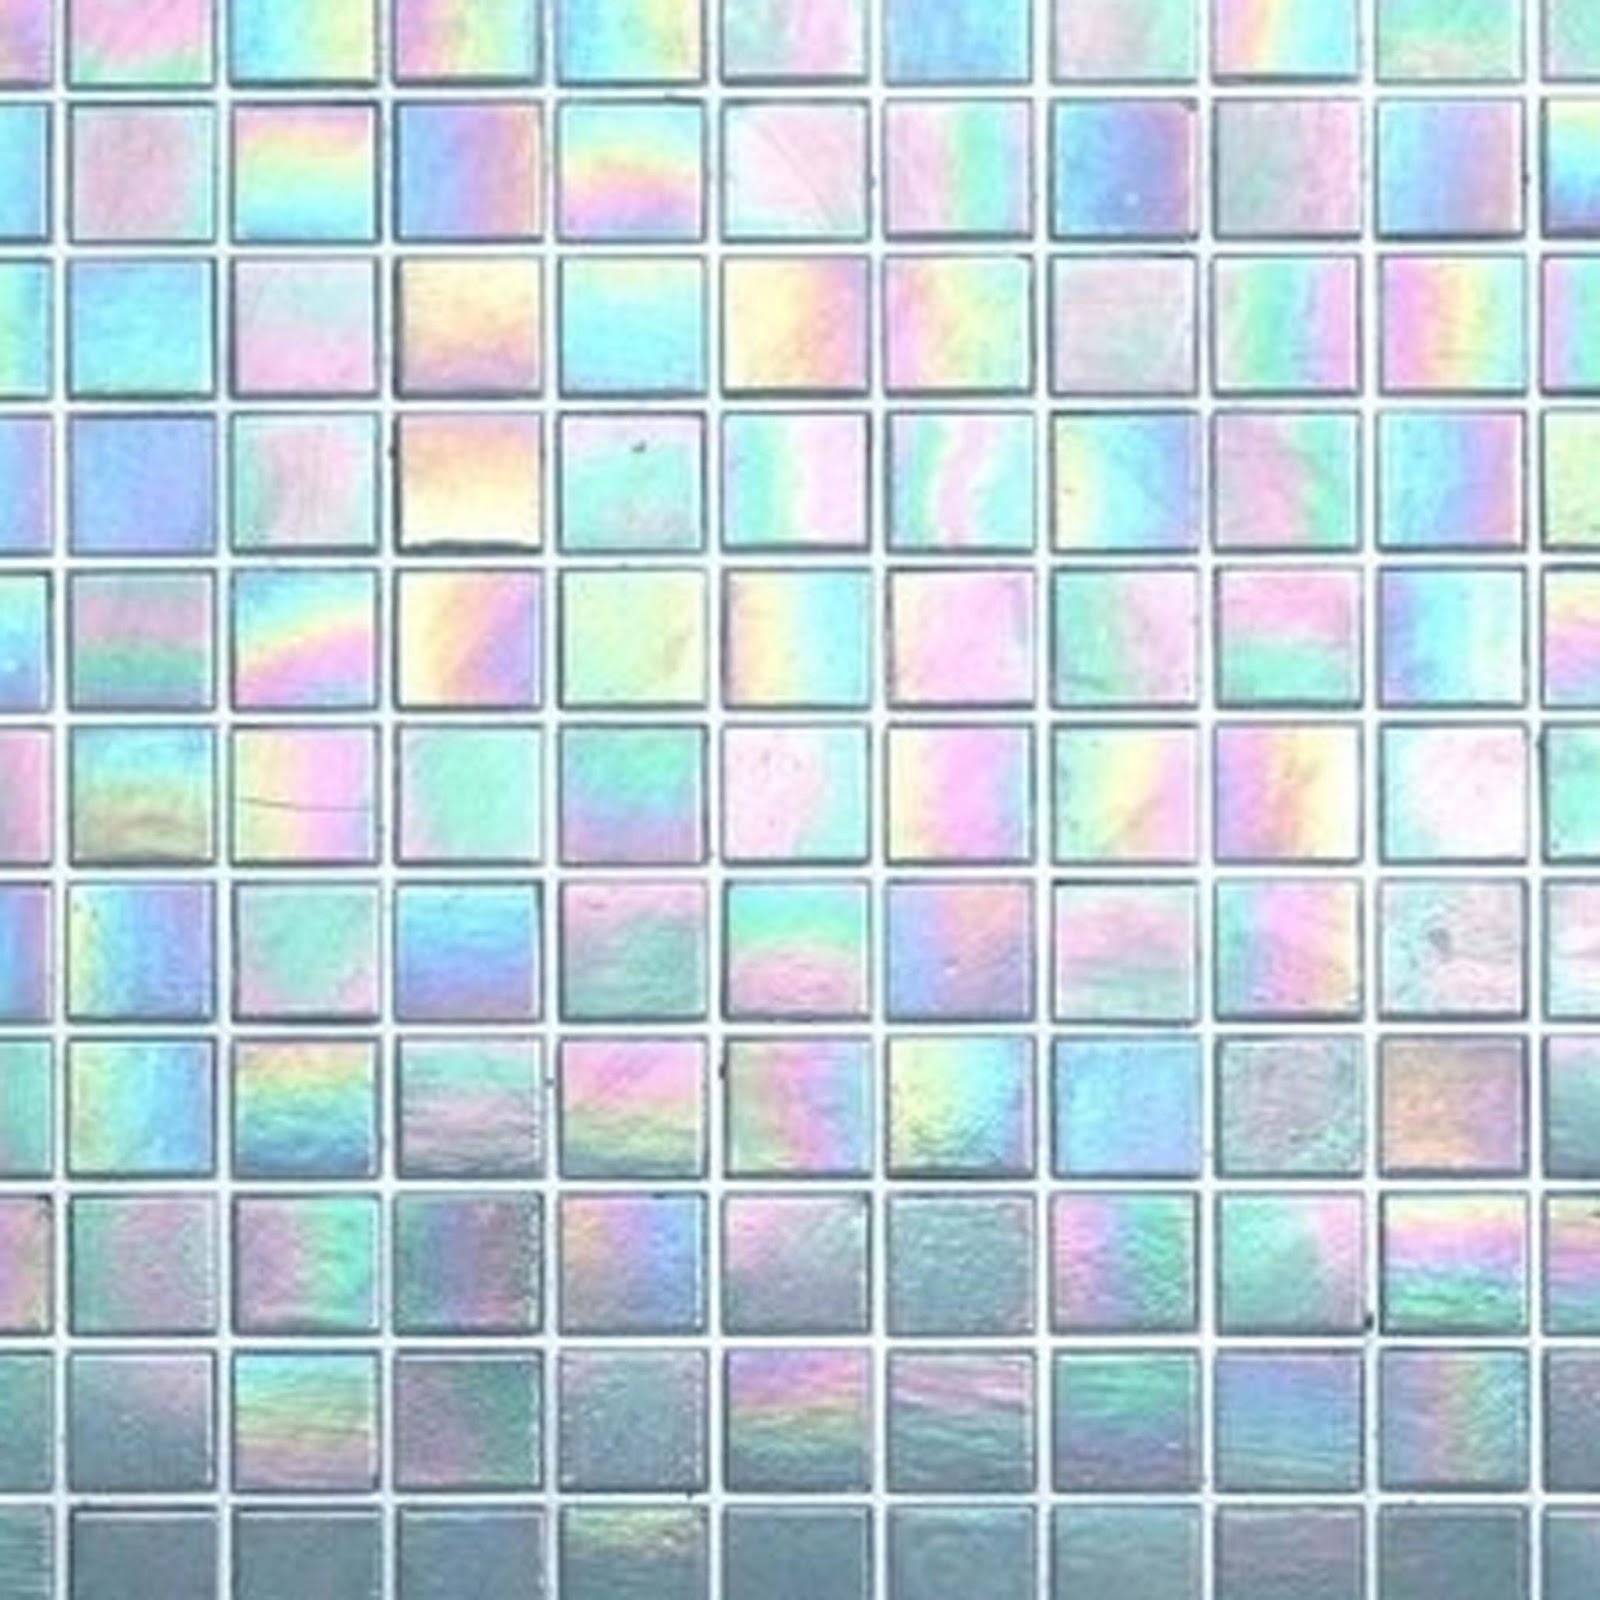 10 amazing texture freebies